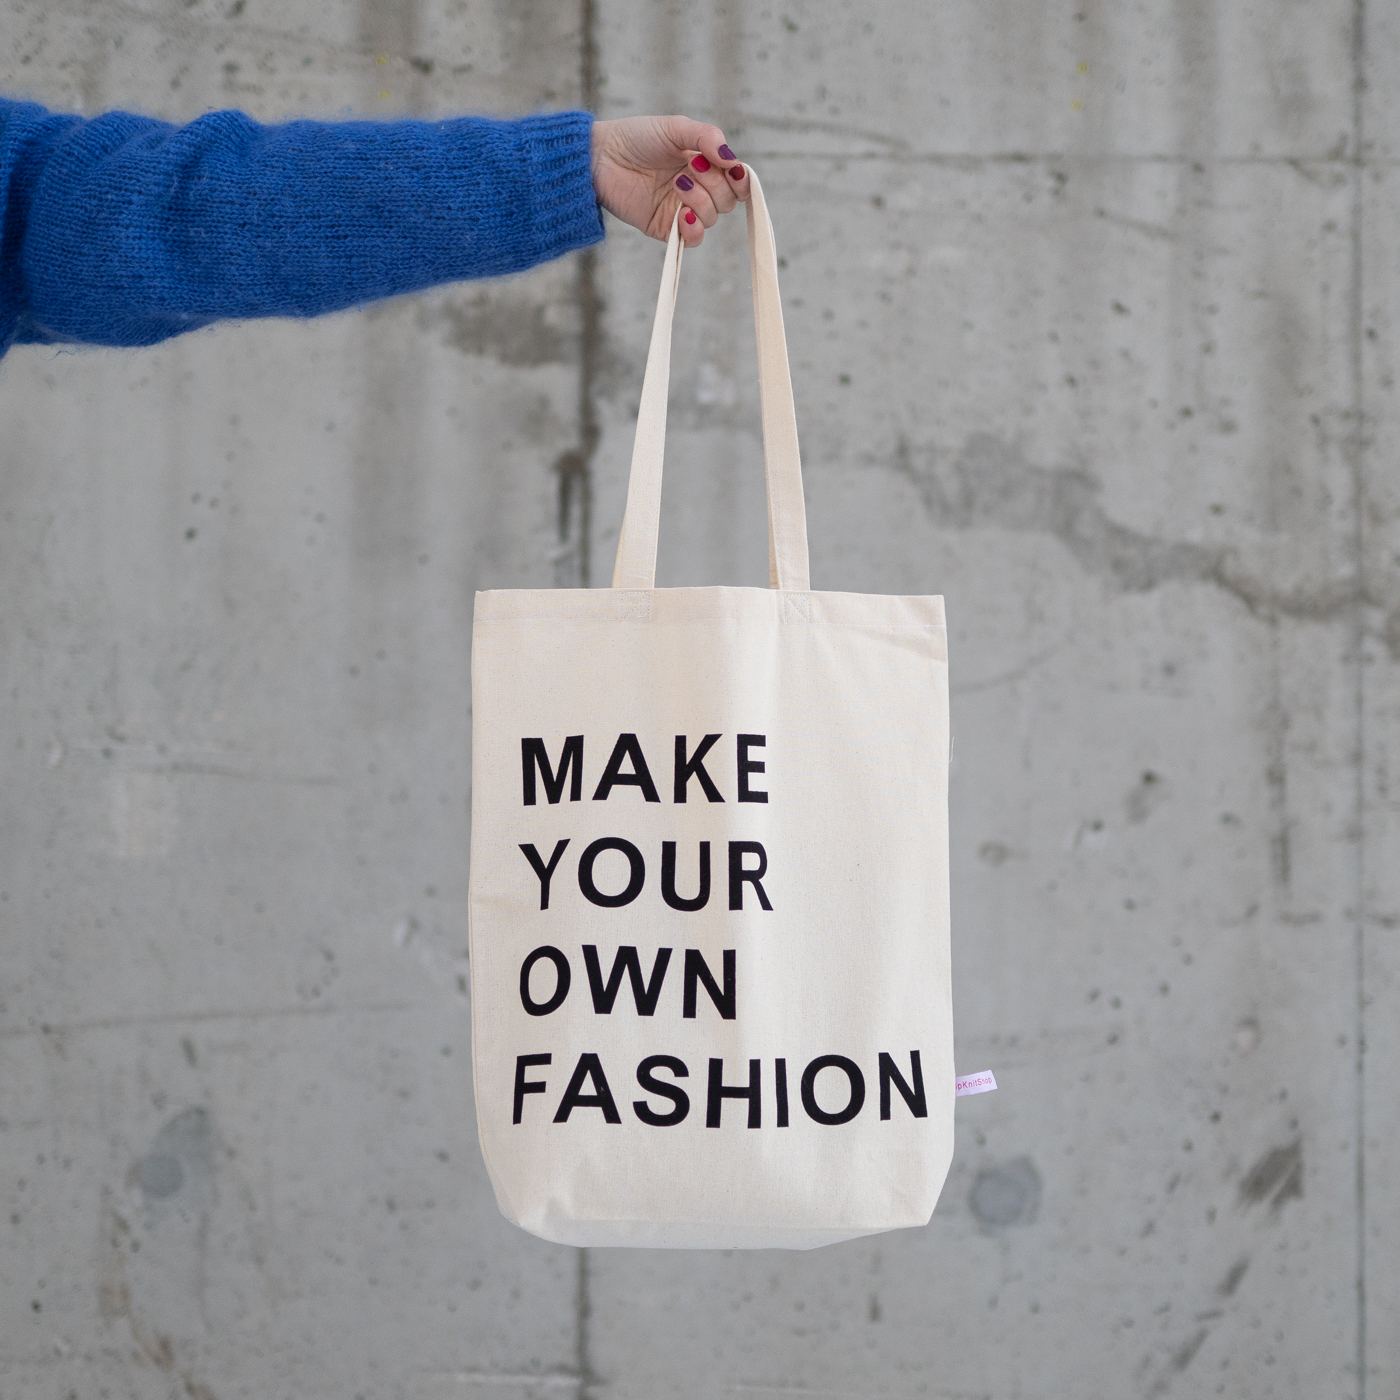 make your own fashion